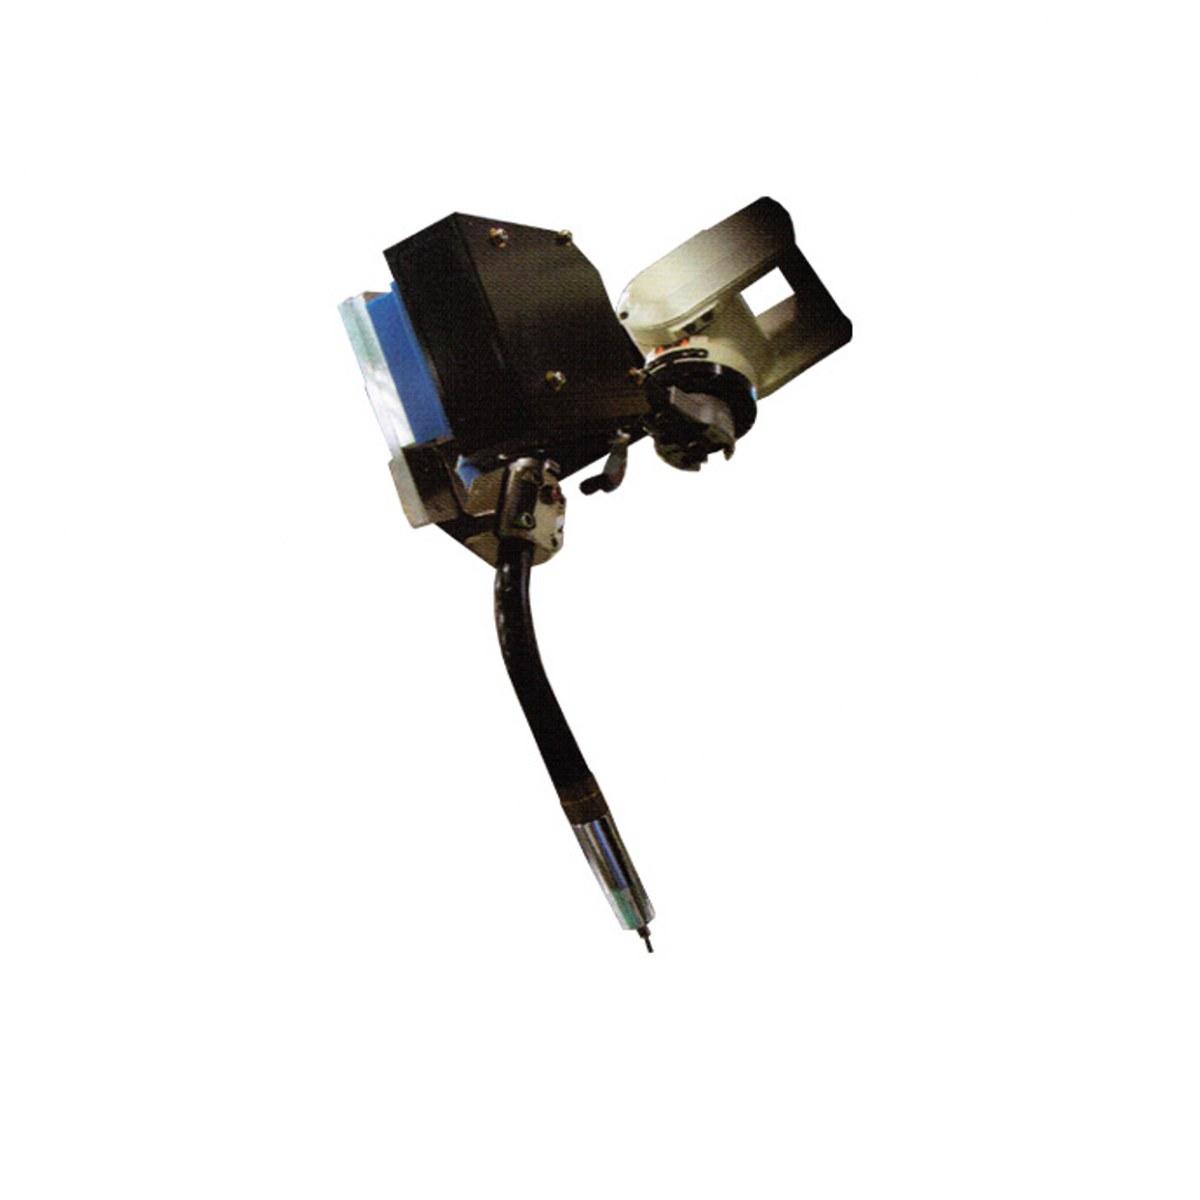 FD-QD Quick Detect Laser Search